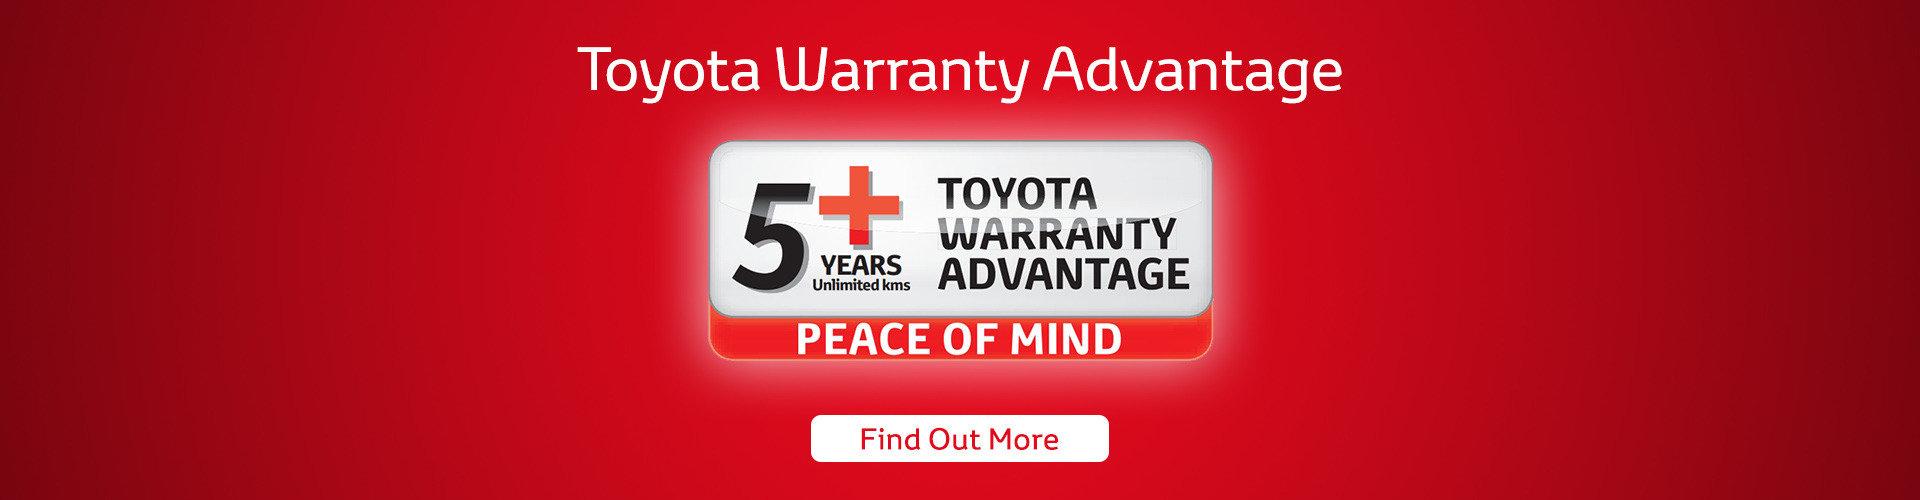 Toyota 5 Year Warranty - Sydney